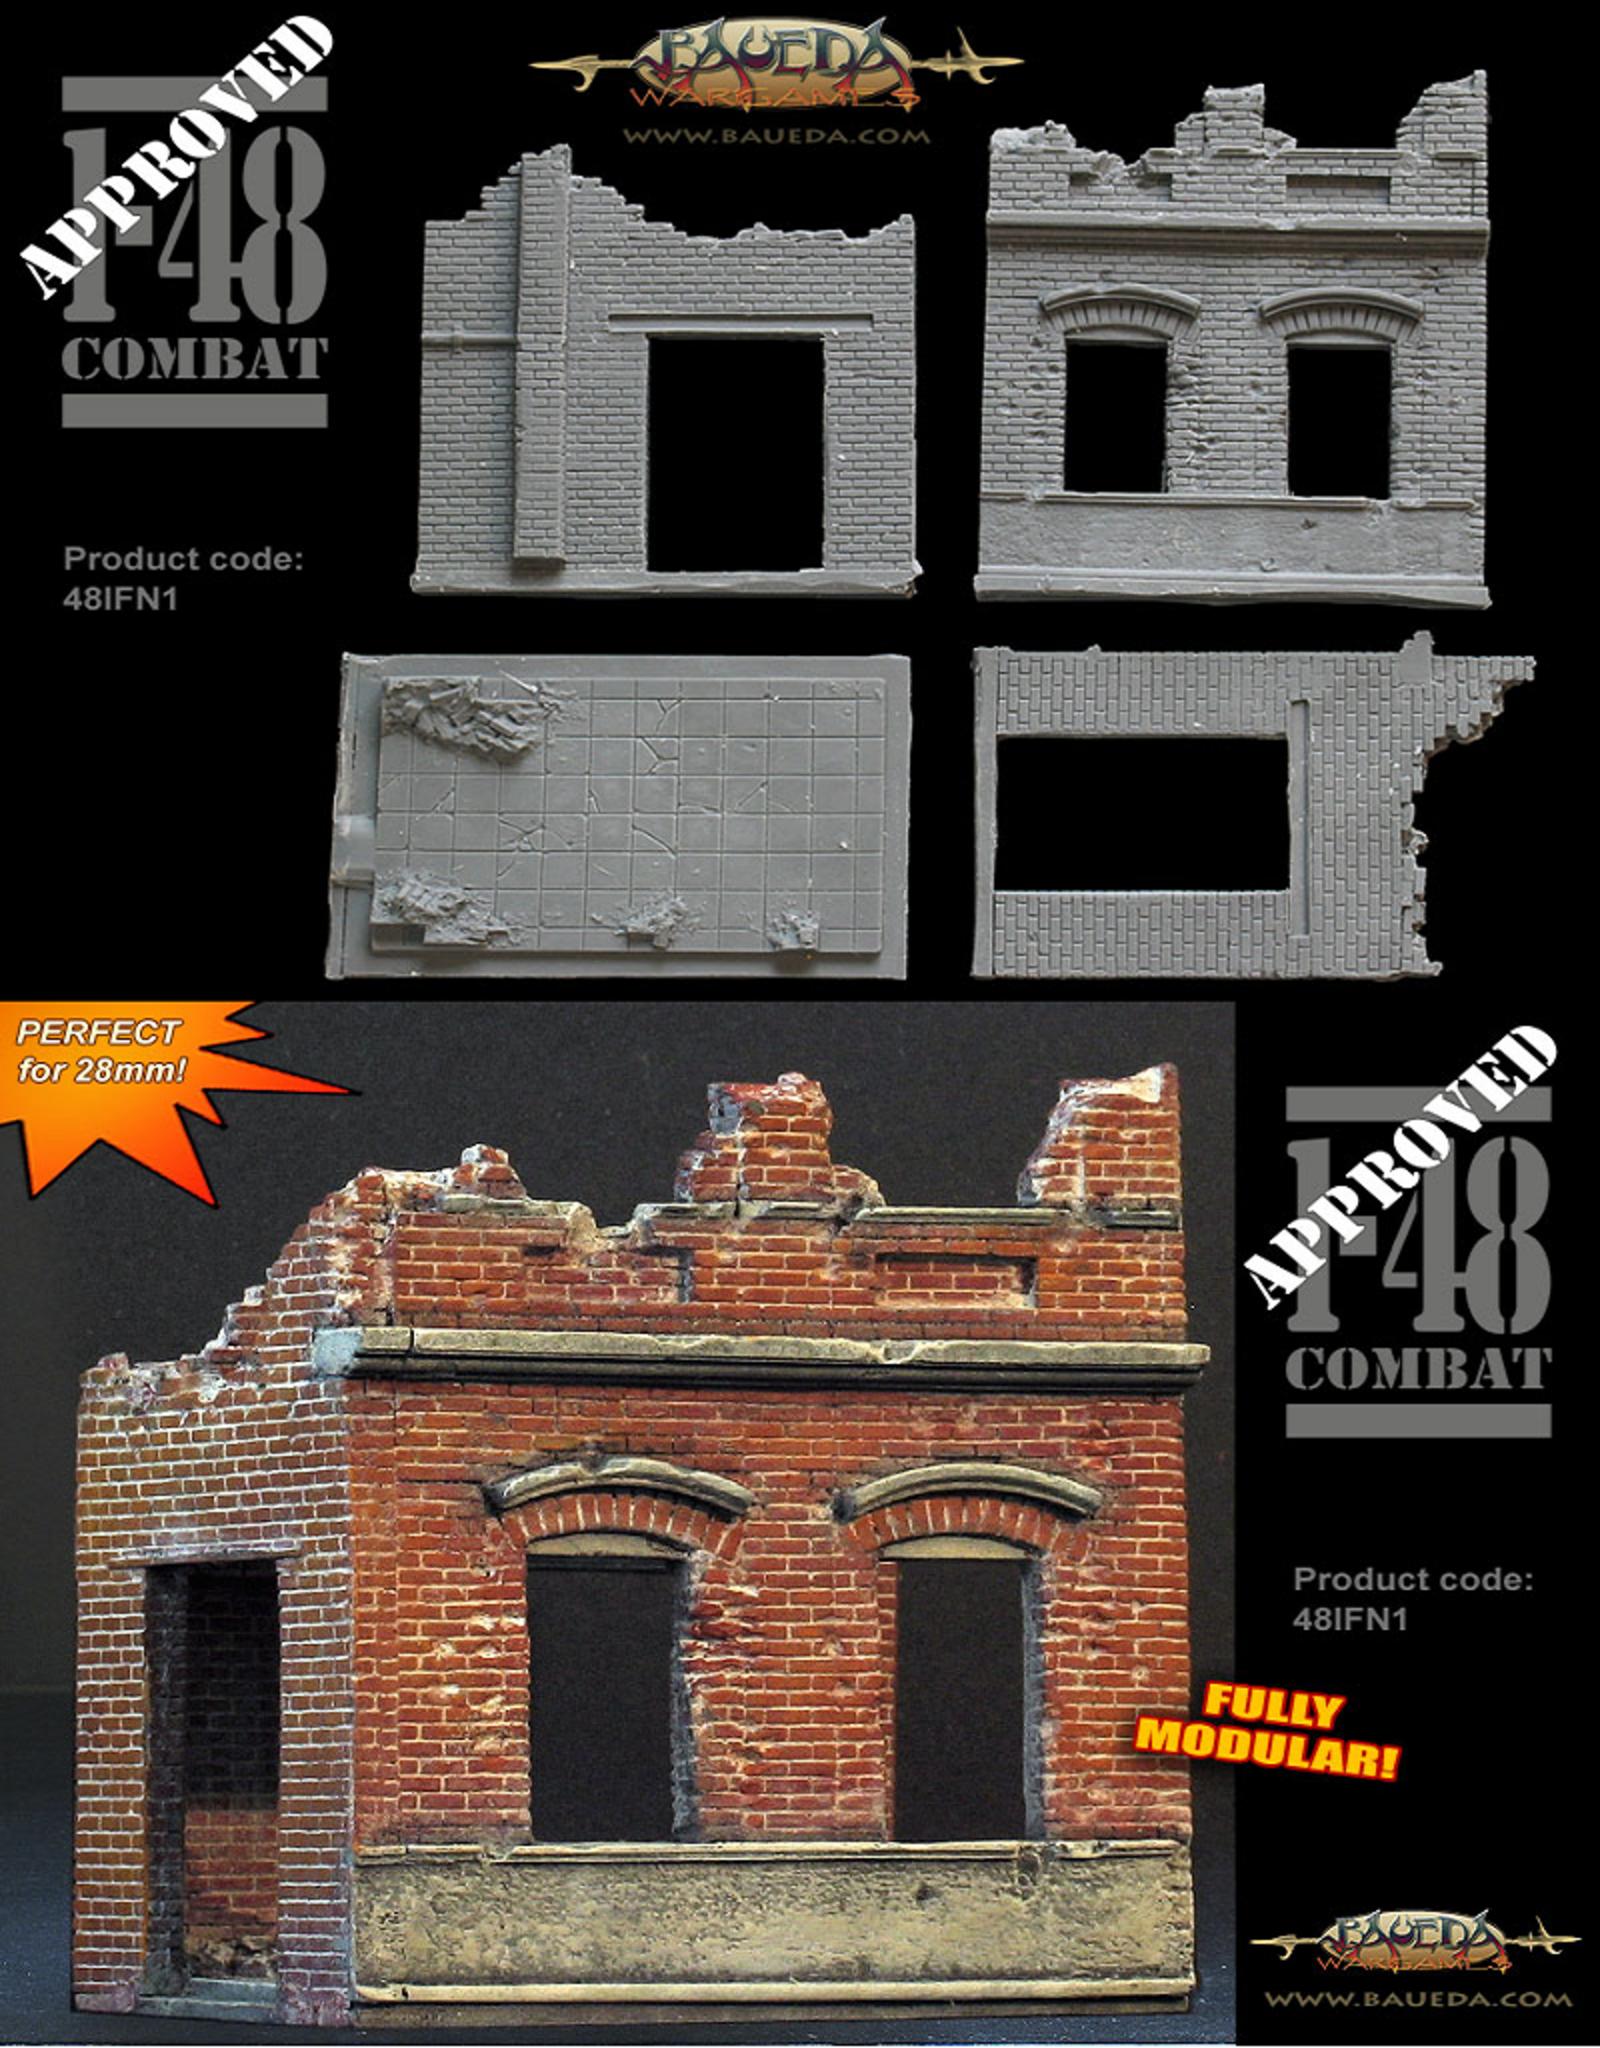 Baueda Ruined factory office block - module 1